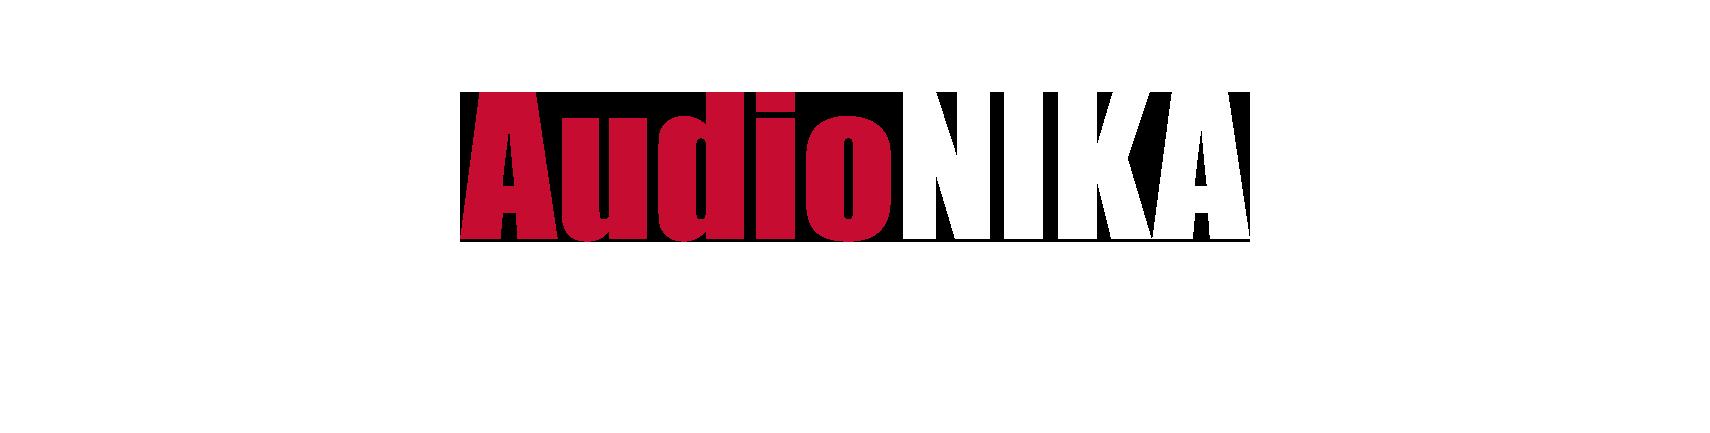 AudioNIKA s.r.o.